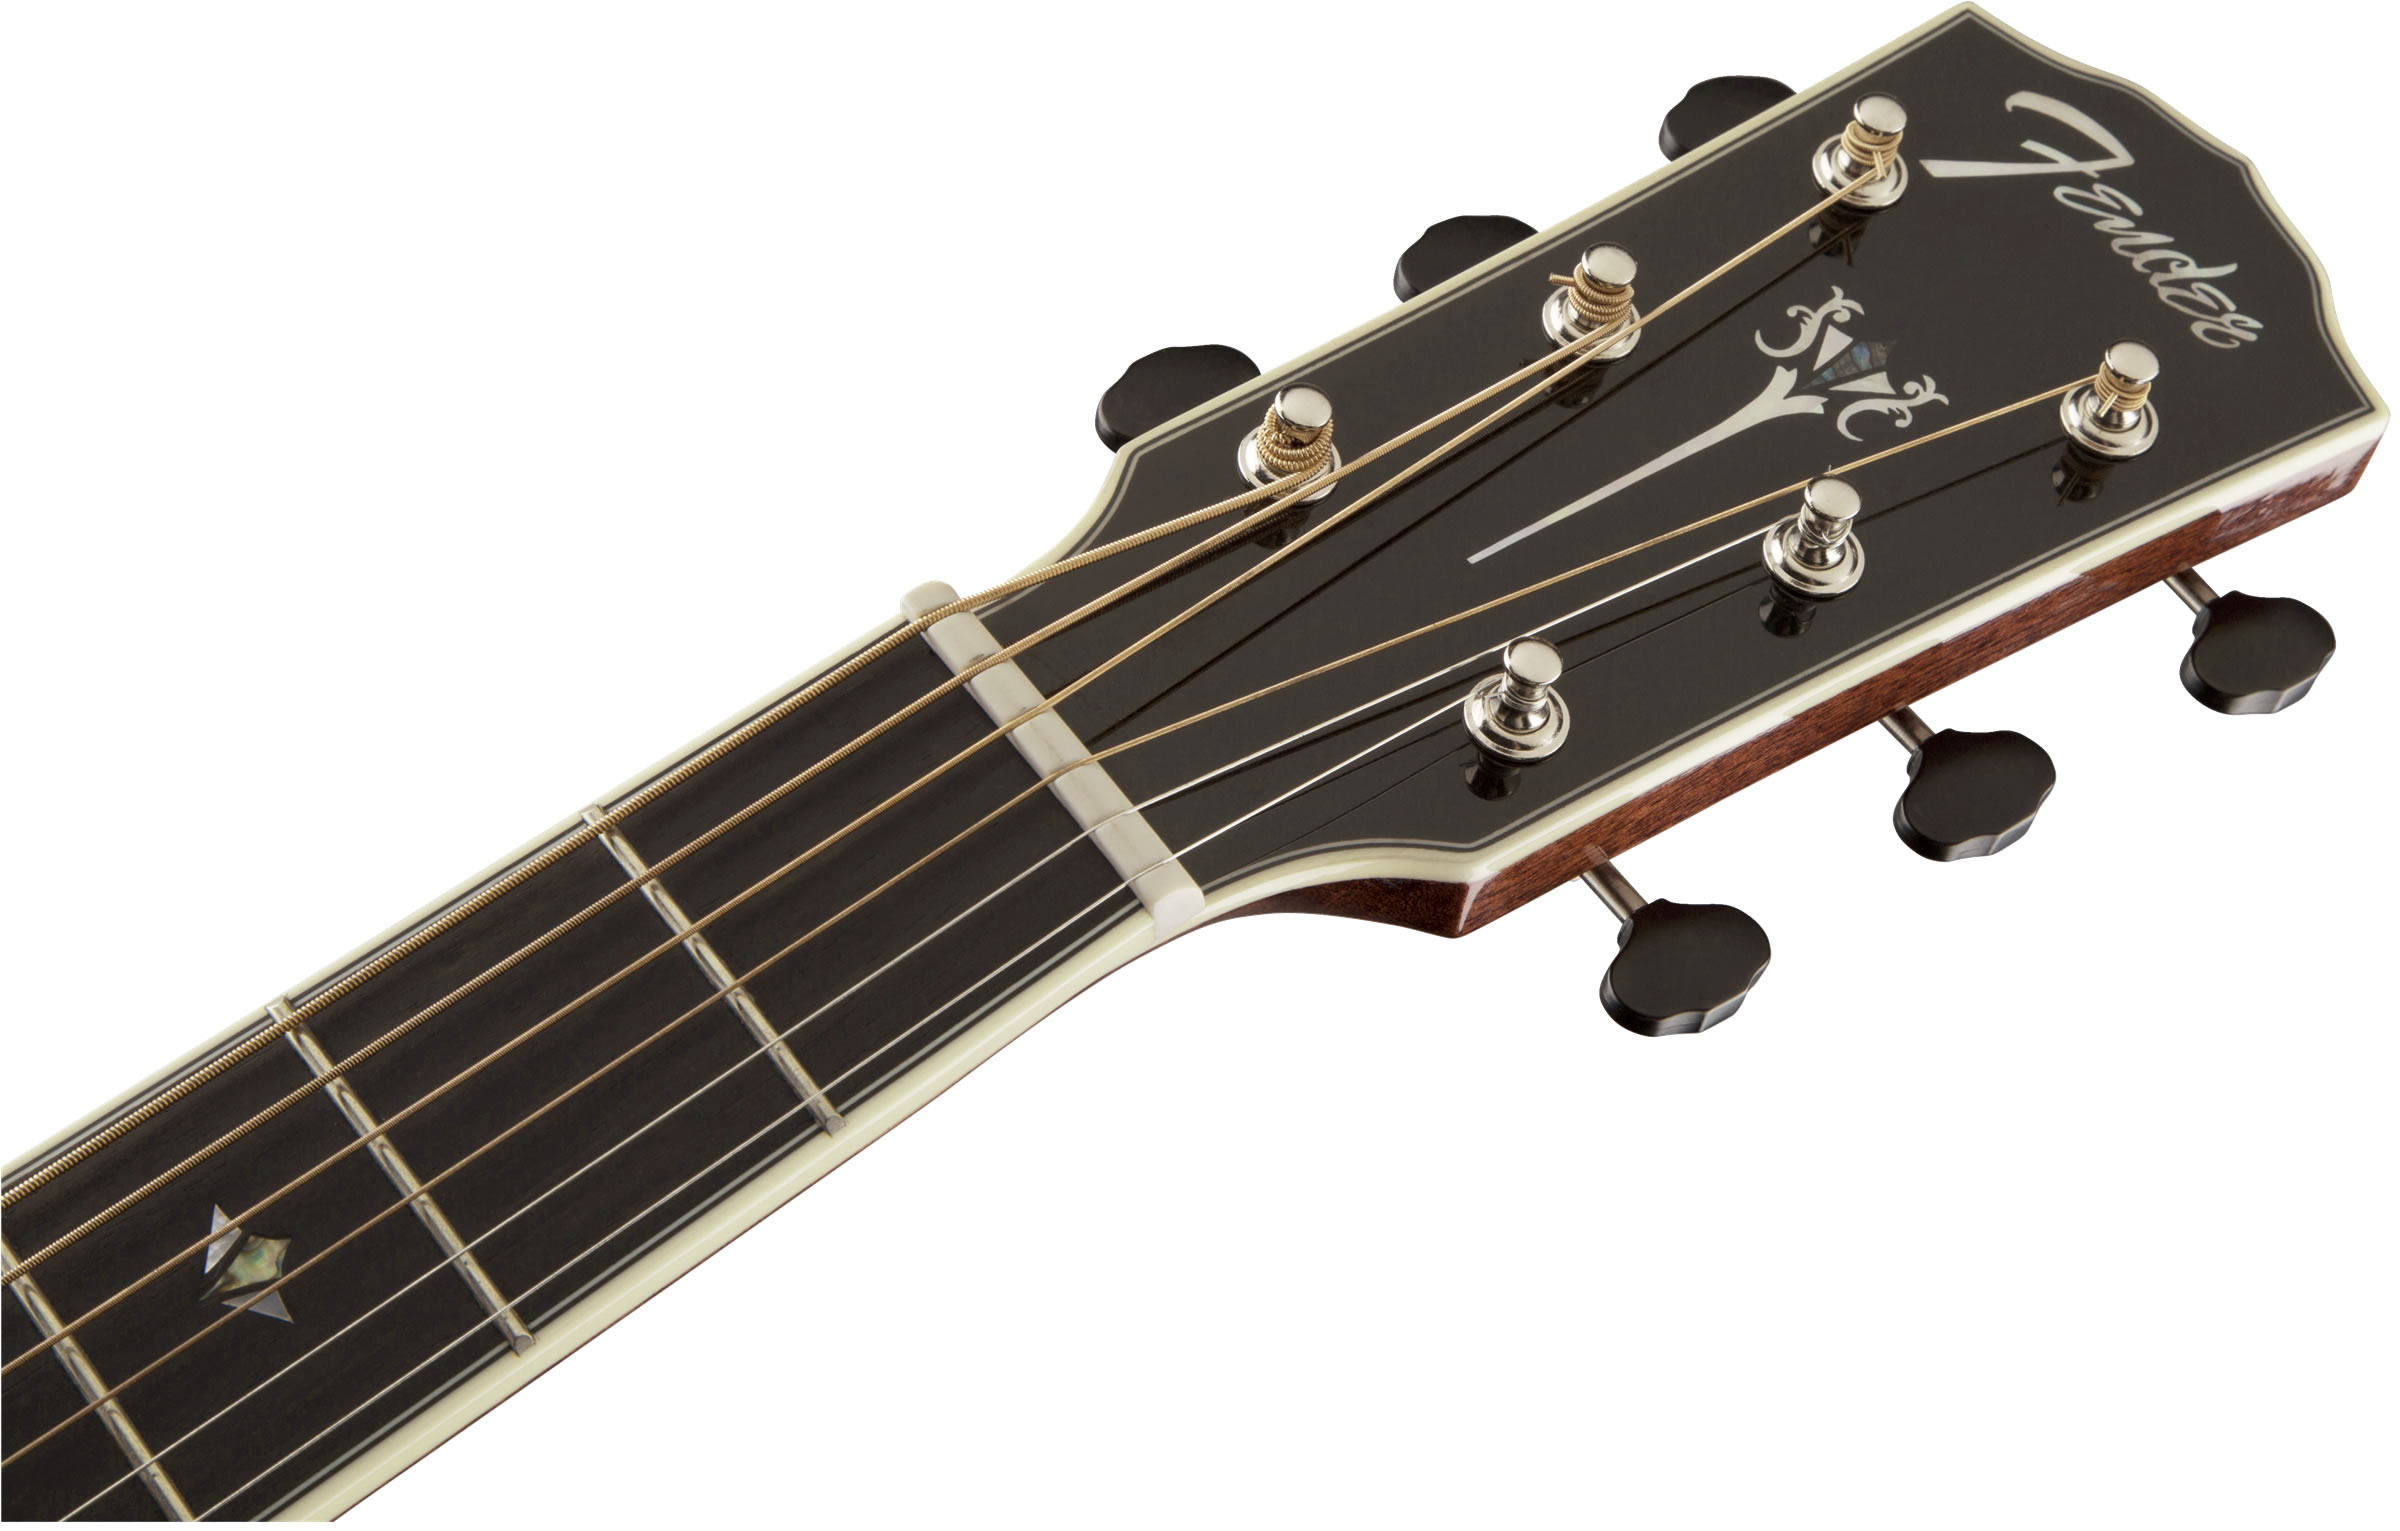 fender paramount series pm 1 deluxe natural elektro akustik gitar mydukkan. Black Bedroom Furniture Sets. Home Design Ideas